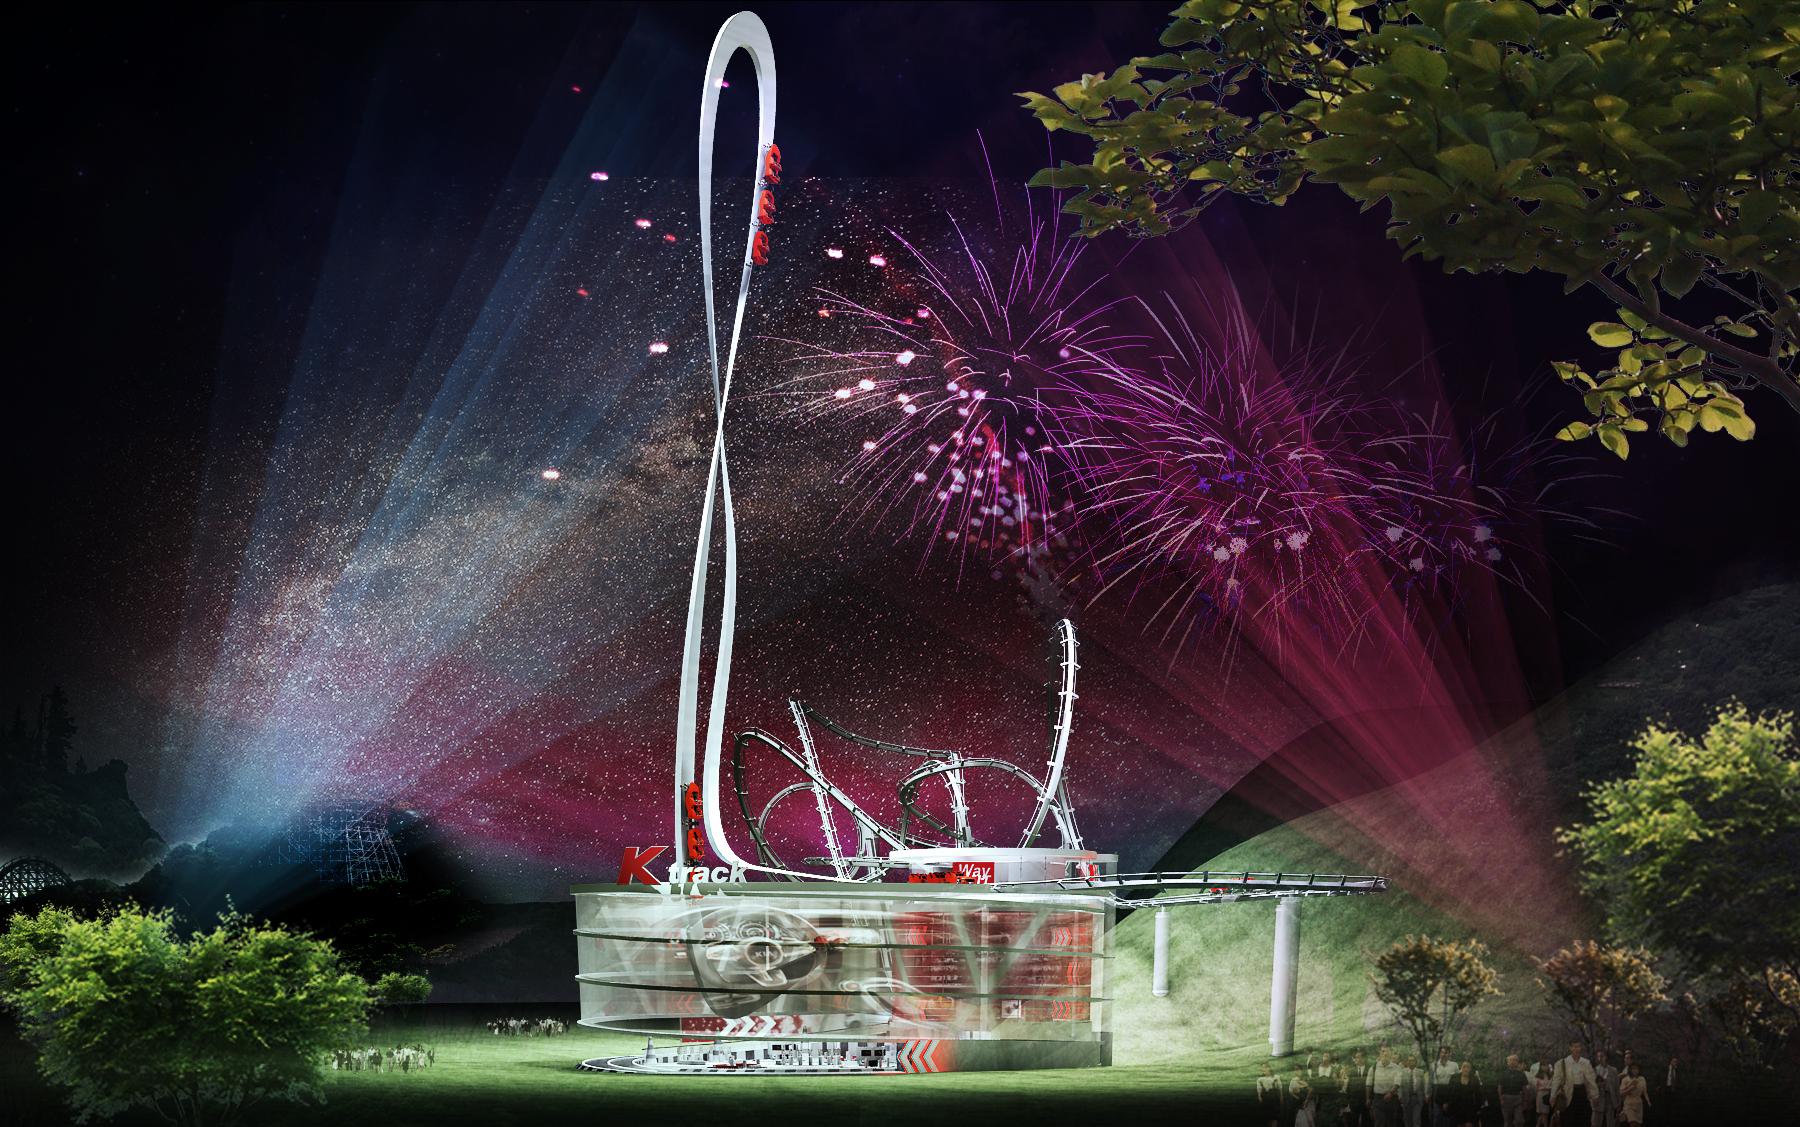 KIA 테마공간구축 프로젝트